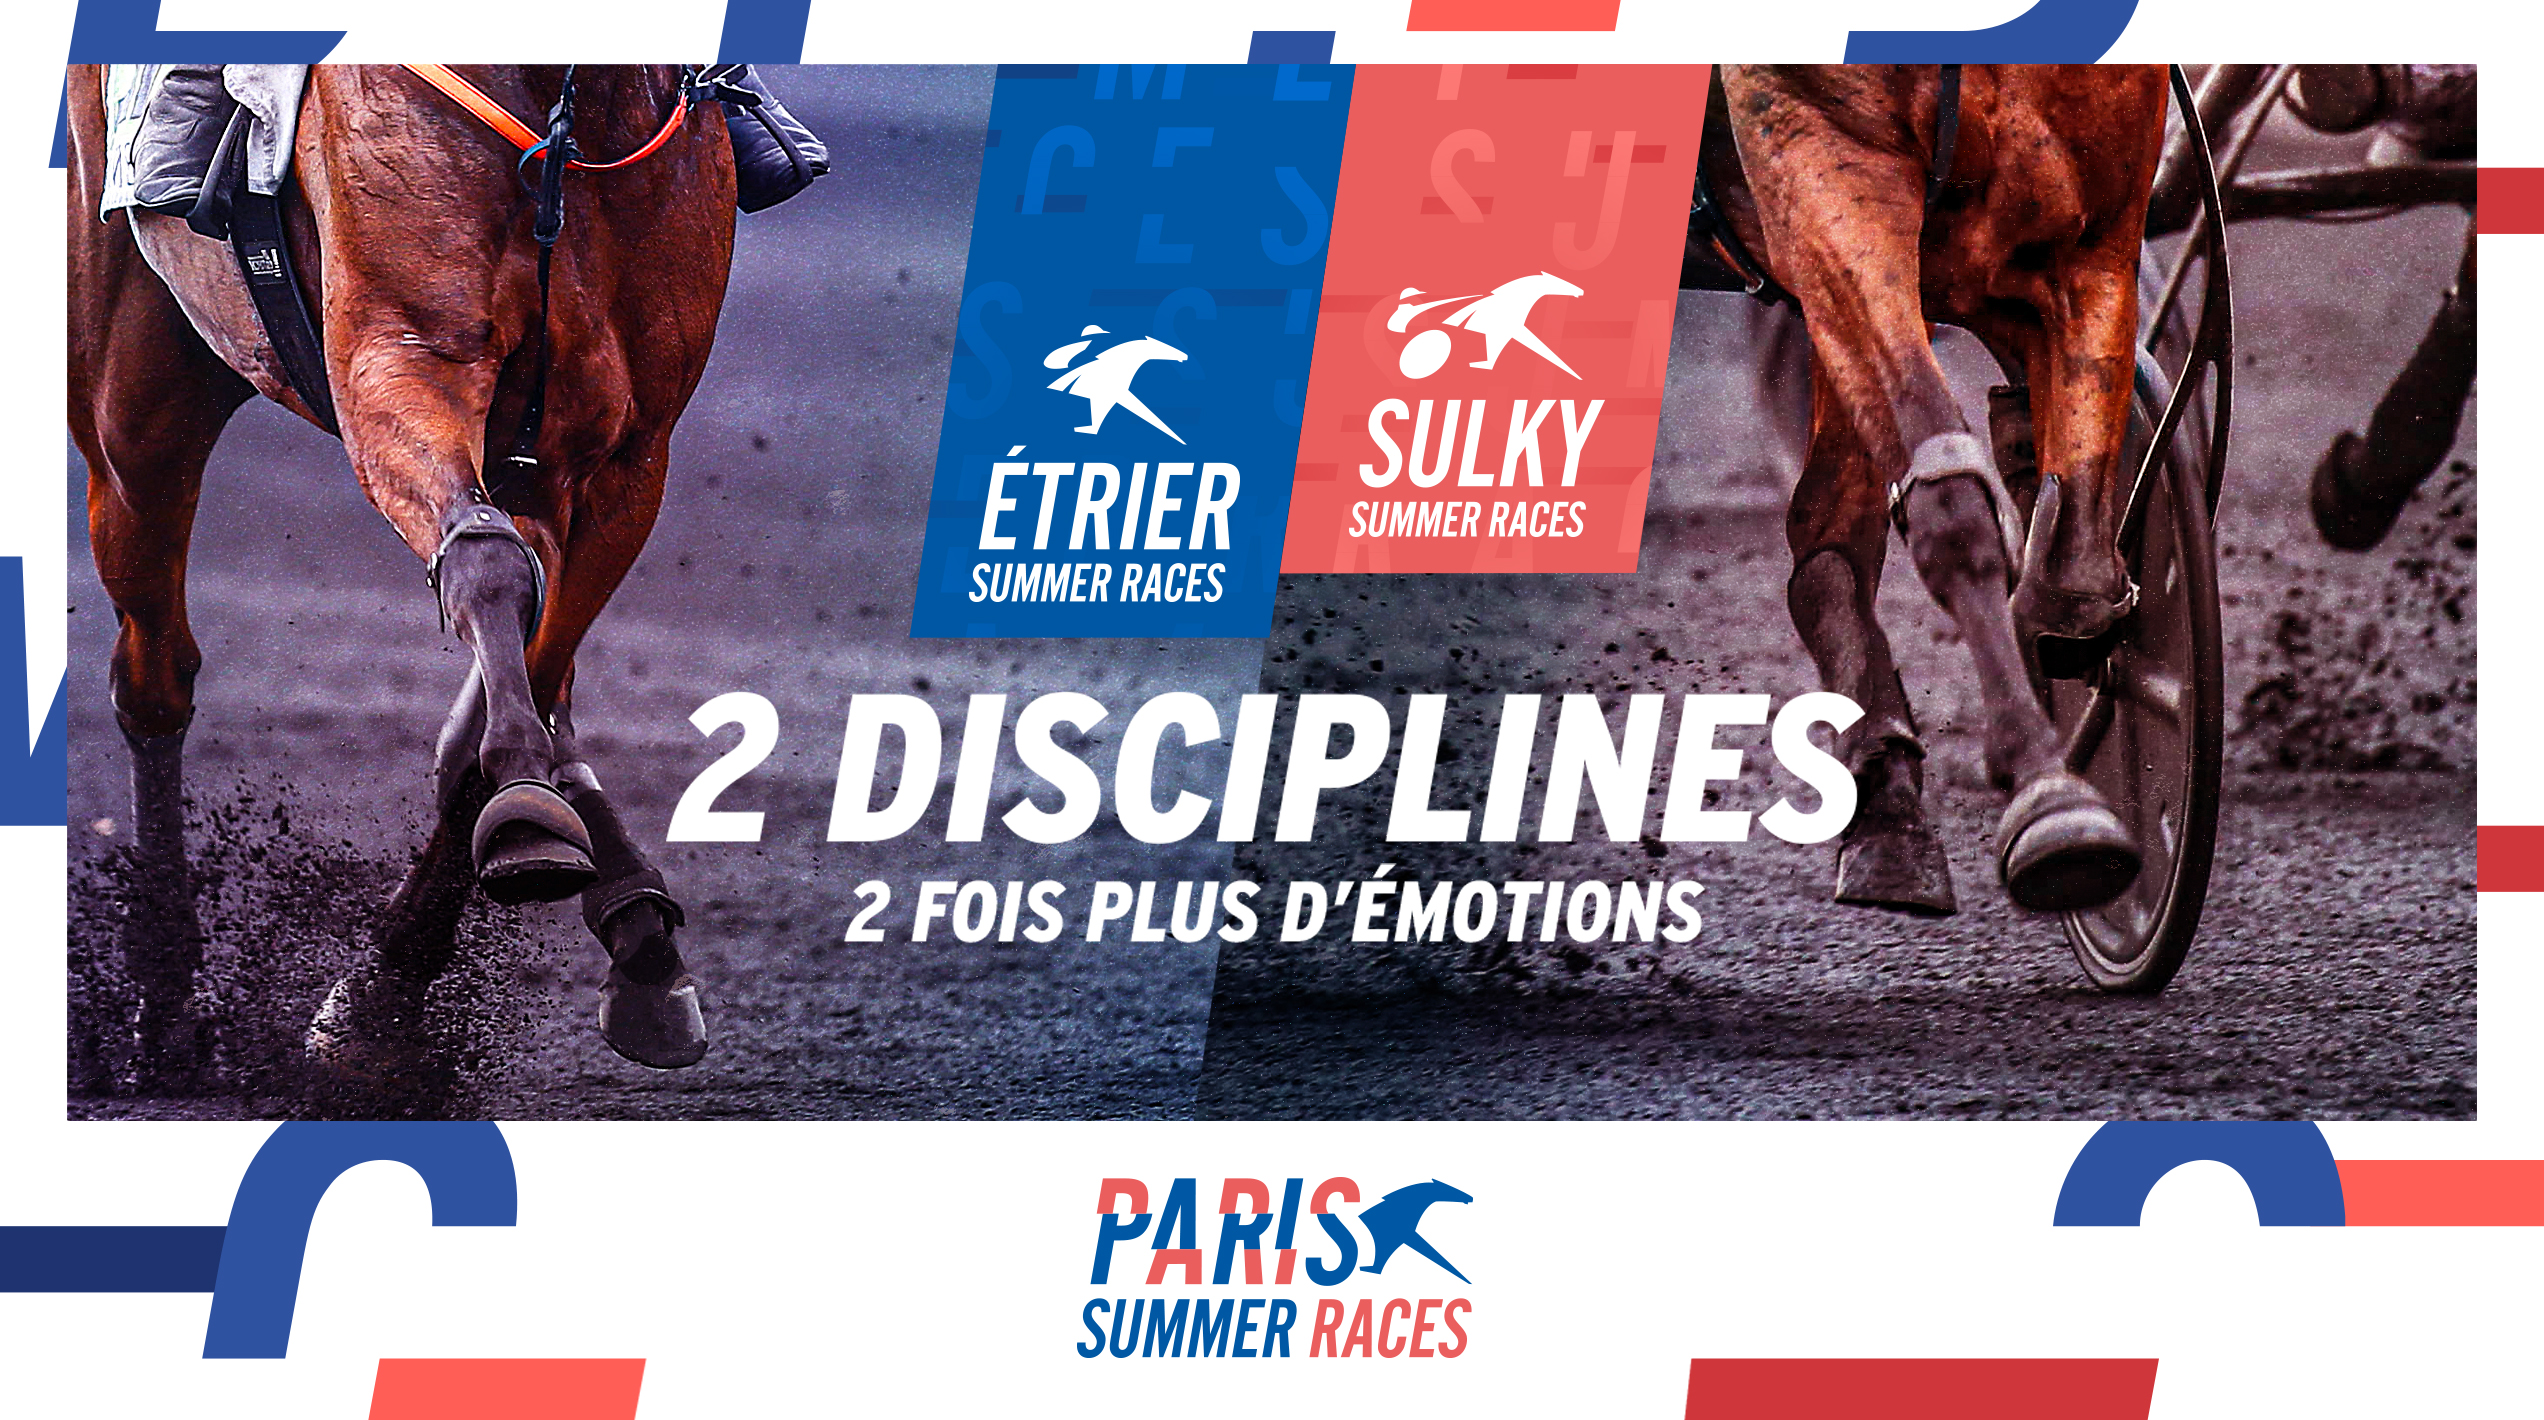 LF2104_Summer_races_2544x1420